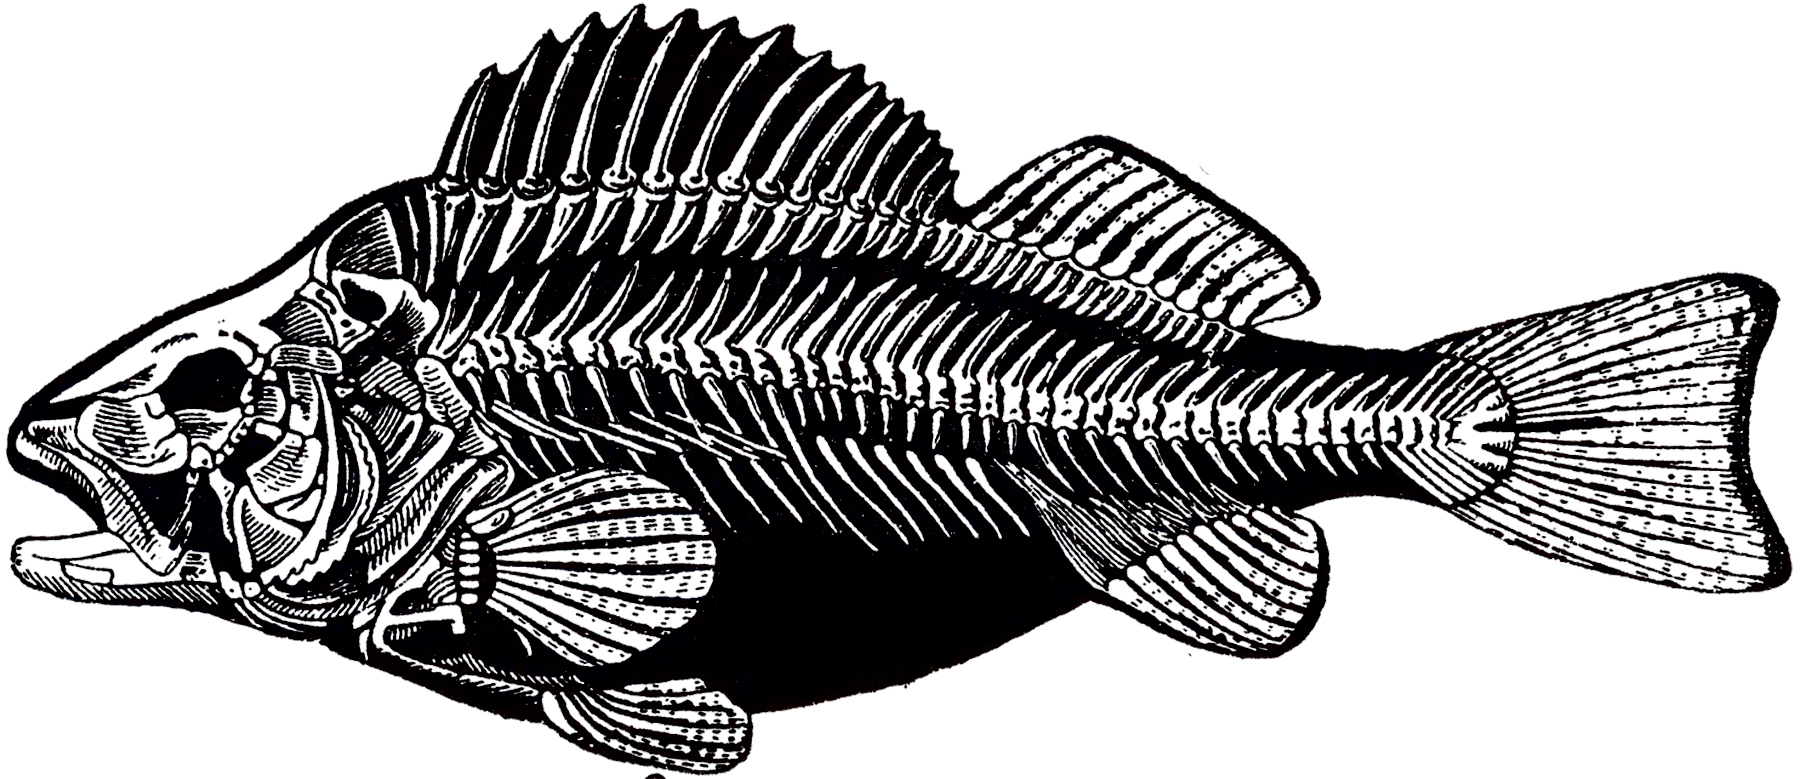 Vintage Fish Skeleton Image